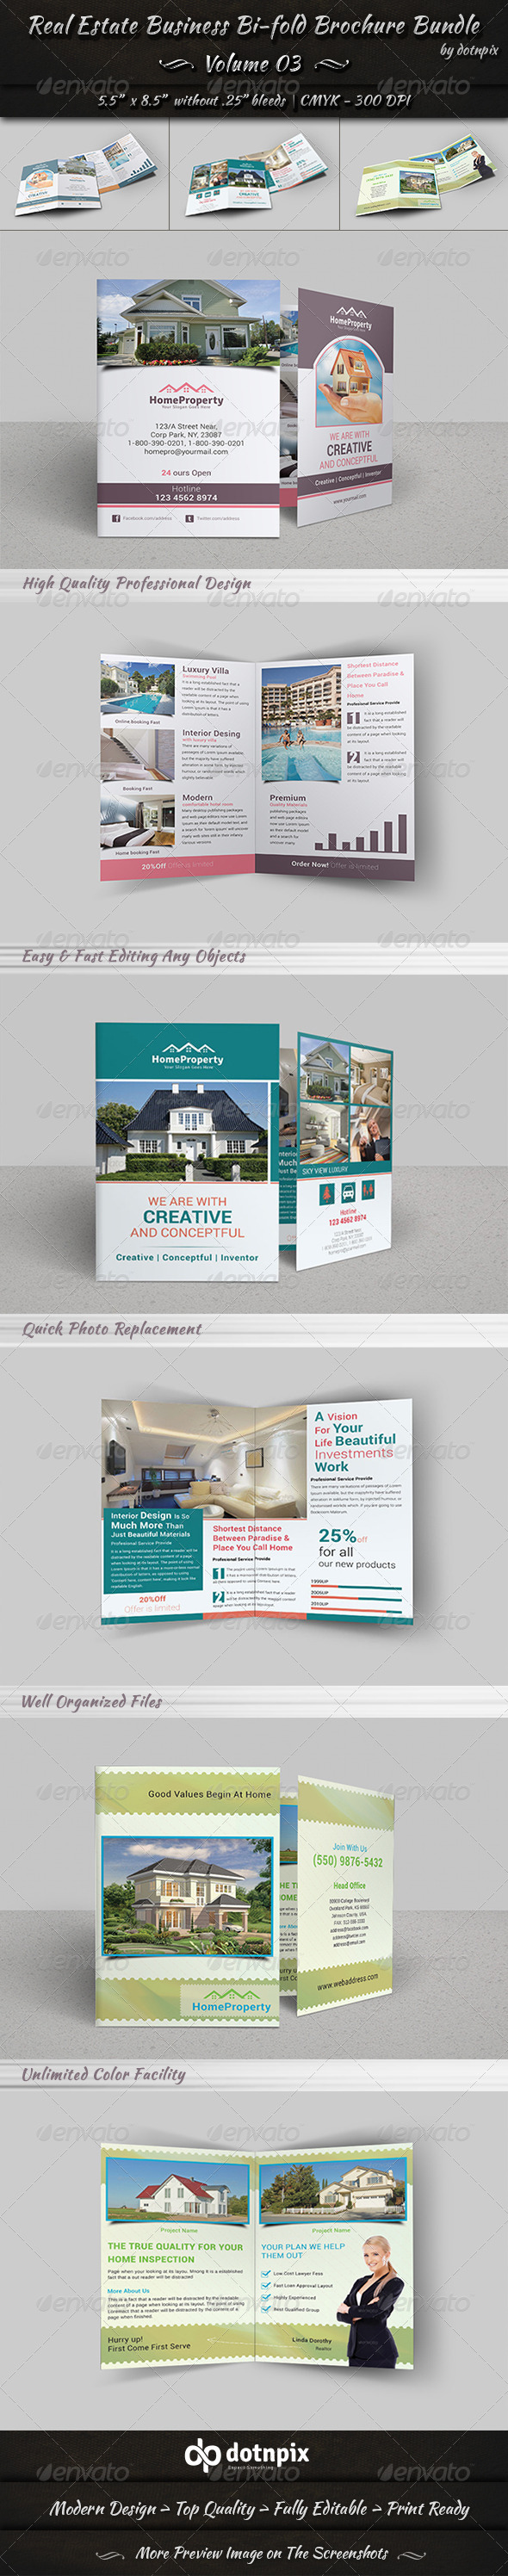 GraphicRiver Real Estate Bi-Fold Brochure Bundle Volume 3 7446004